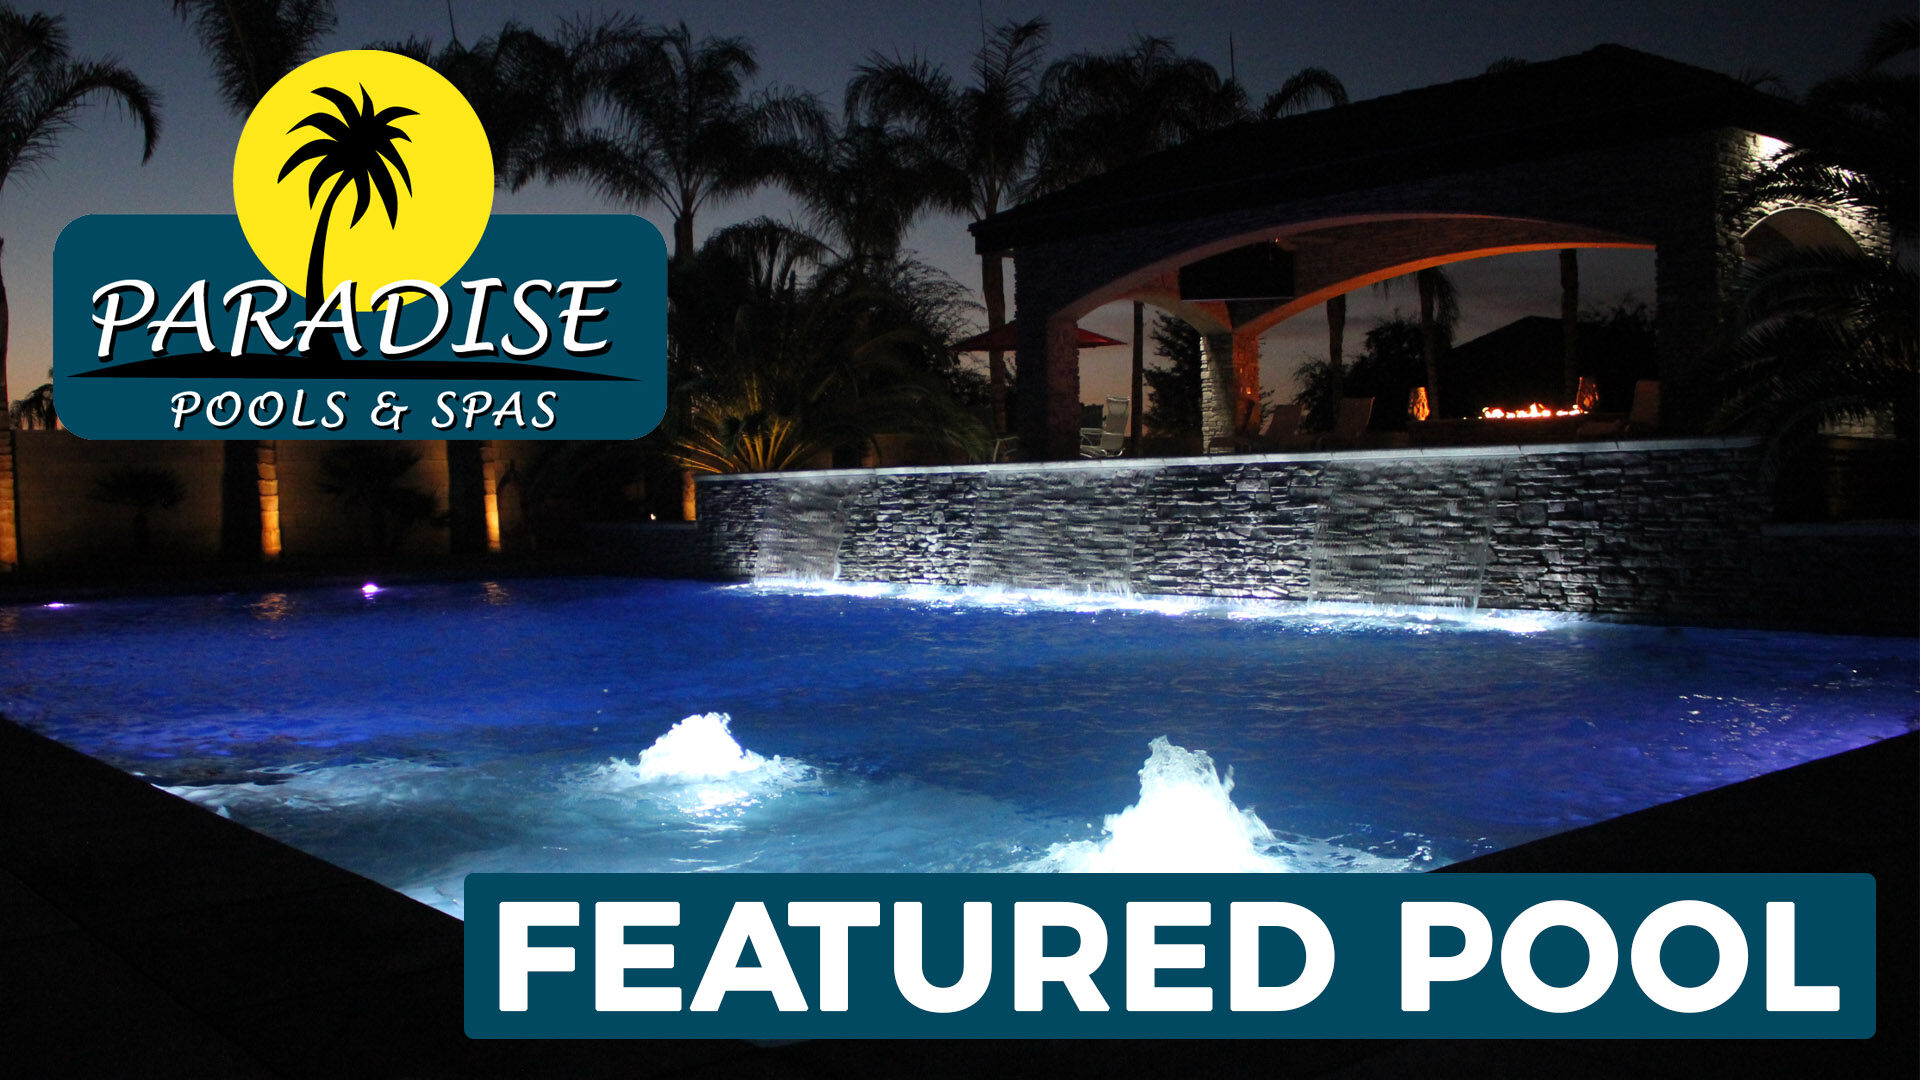 Beautiful Custom Swimming Pool Lit Up at Night